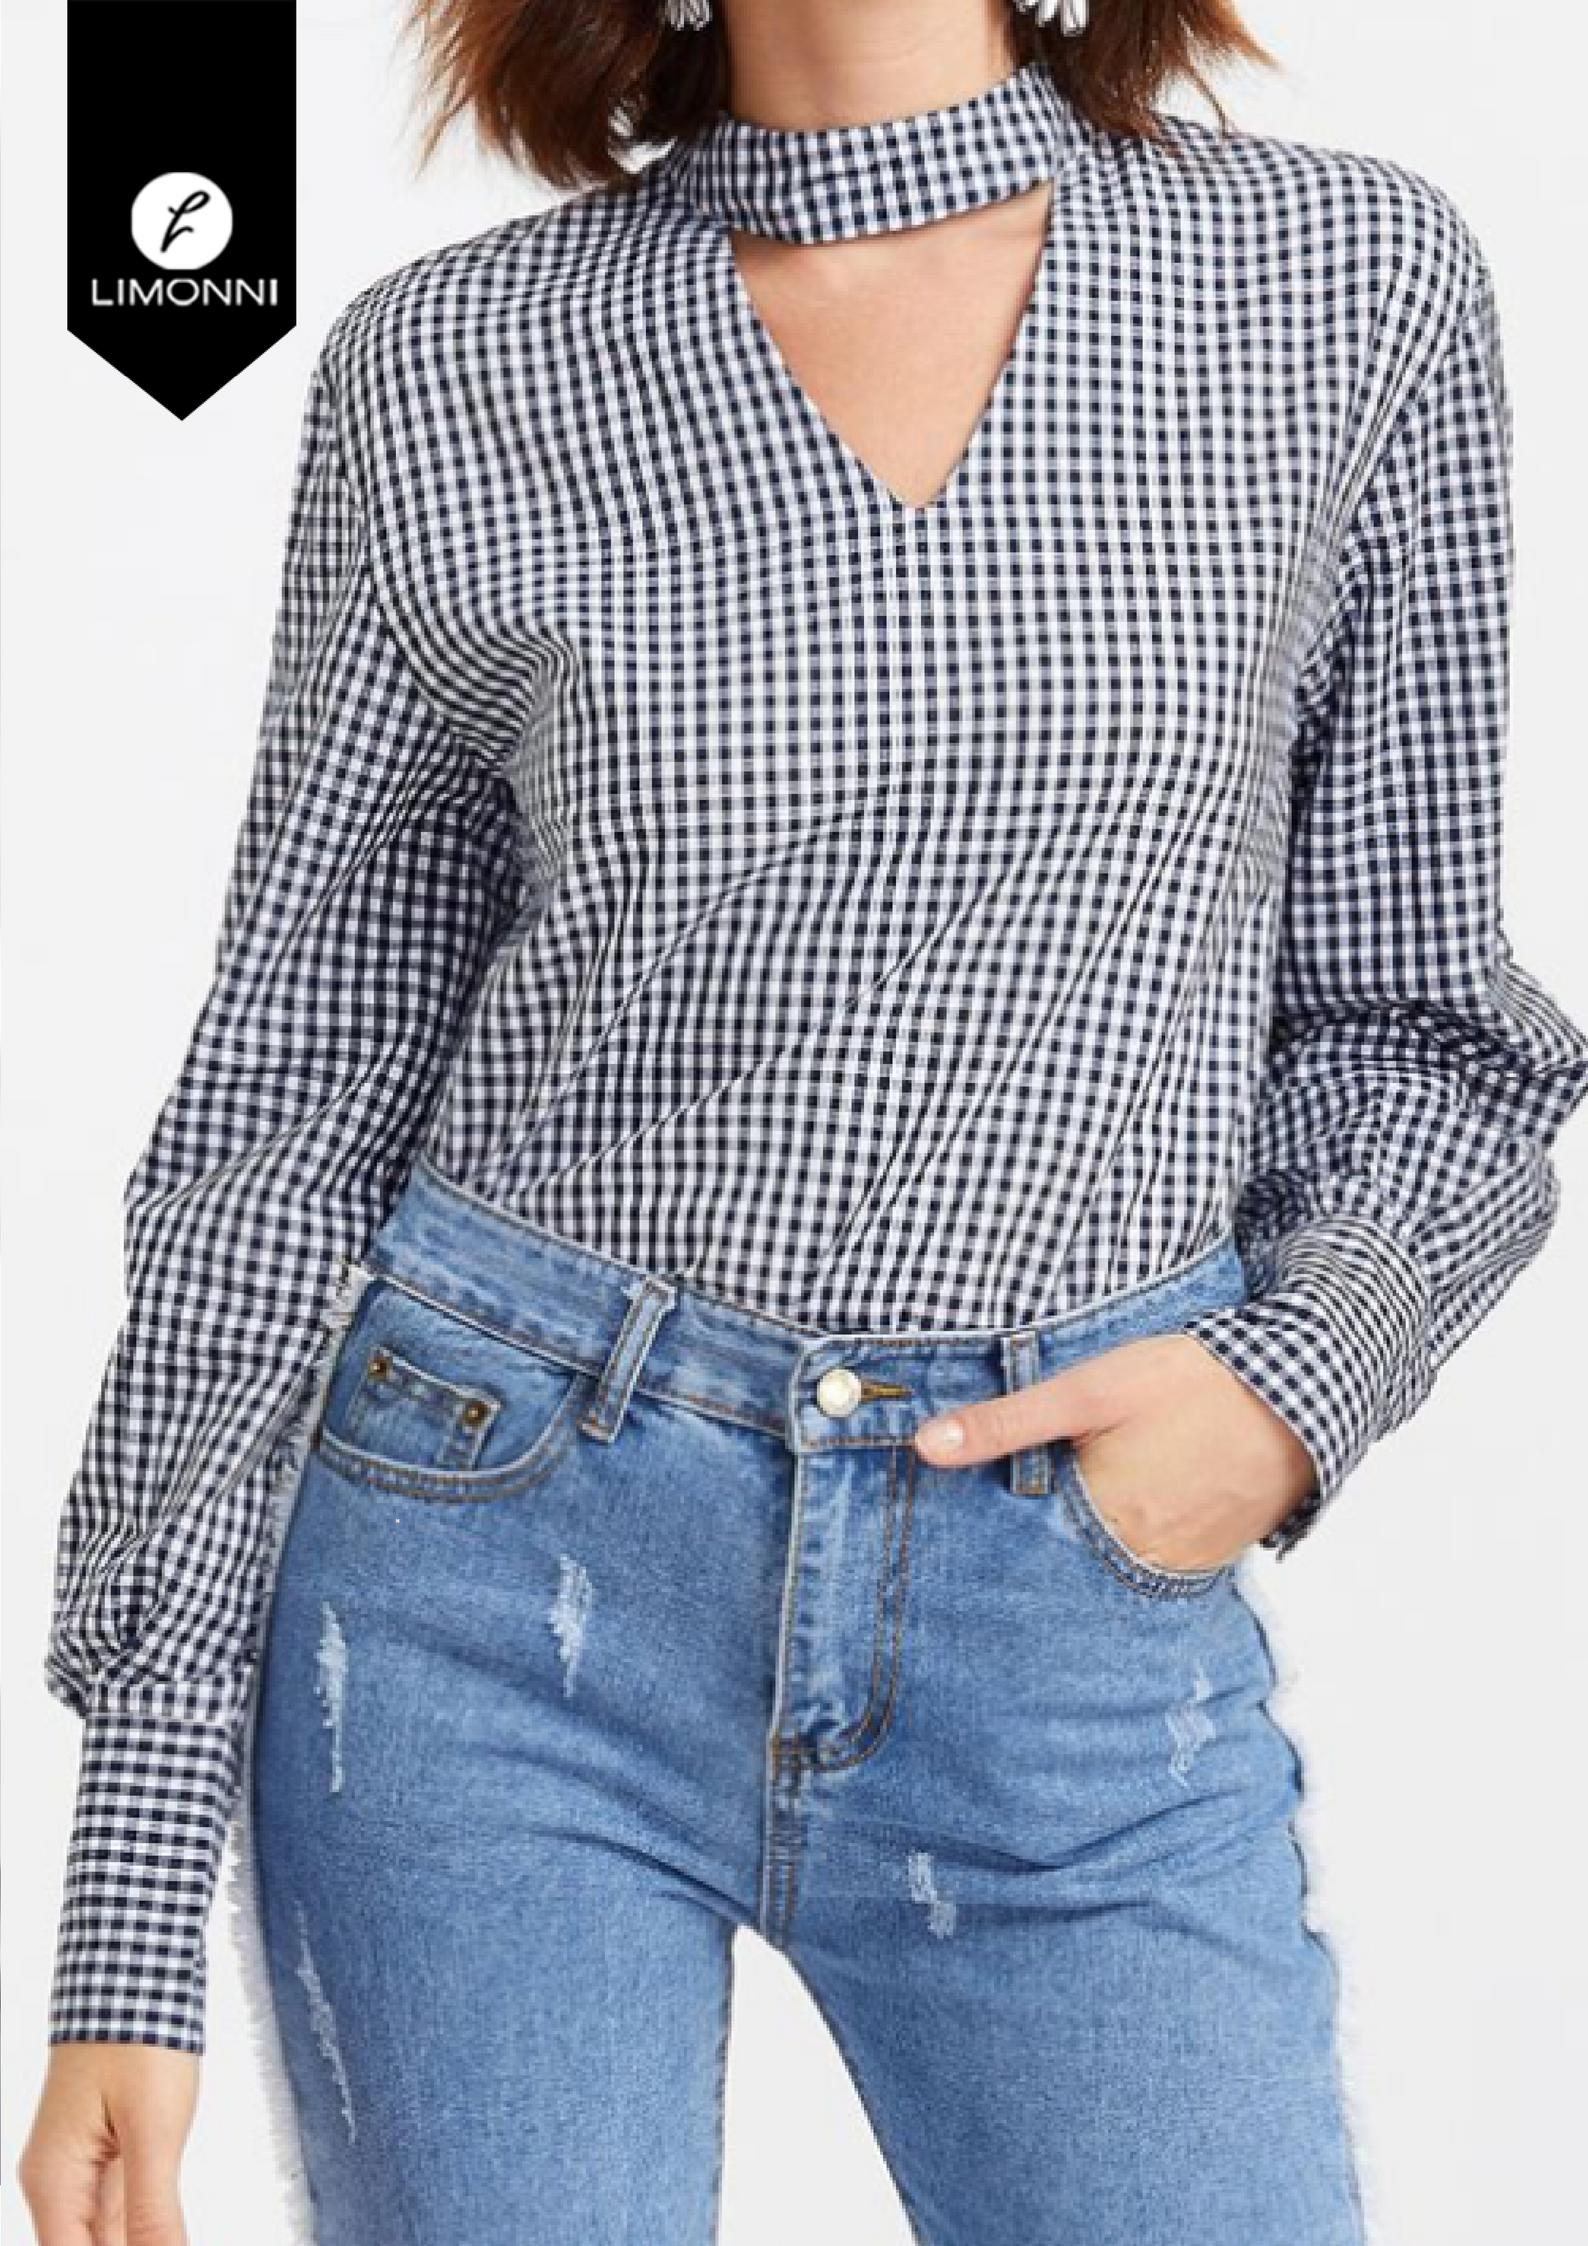 Blusas para mujer Limonni Bennett LI1405 Camiseras